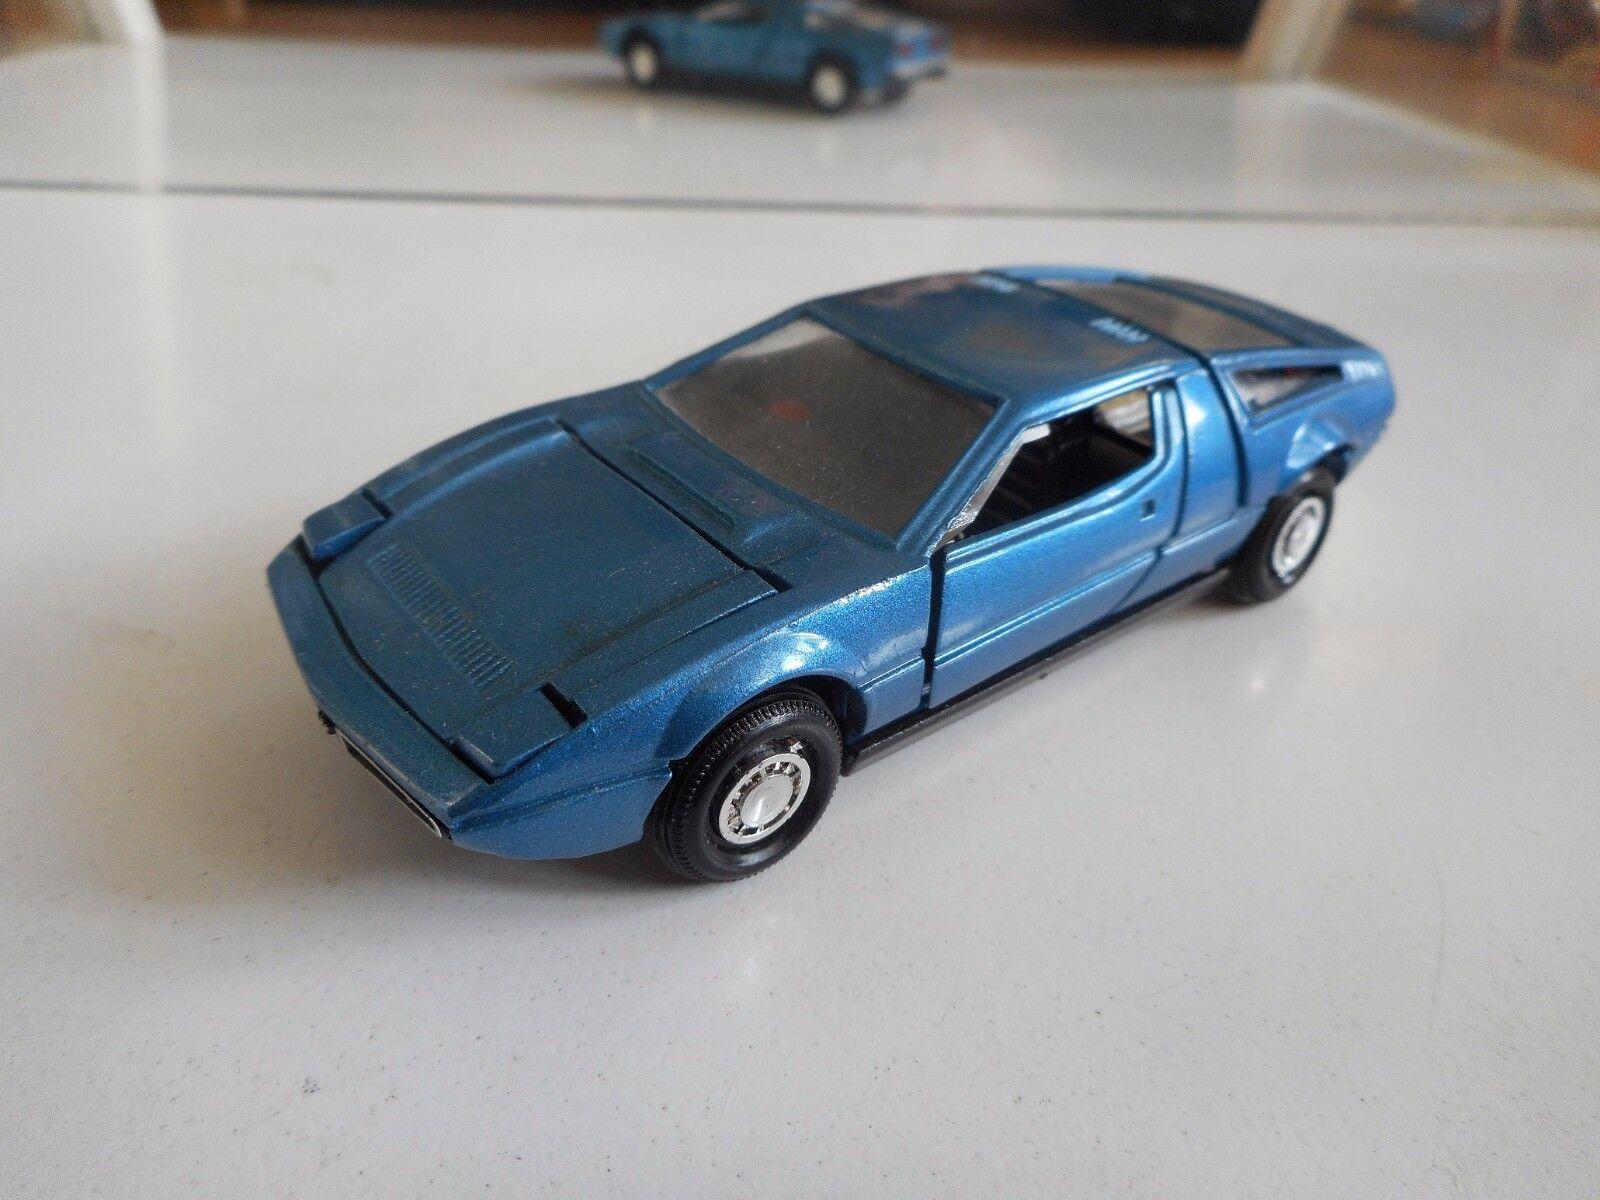 Yonezawa giocattoli Diapet Maserati Bora in blu